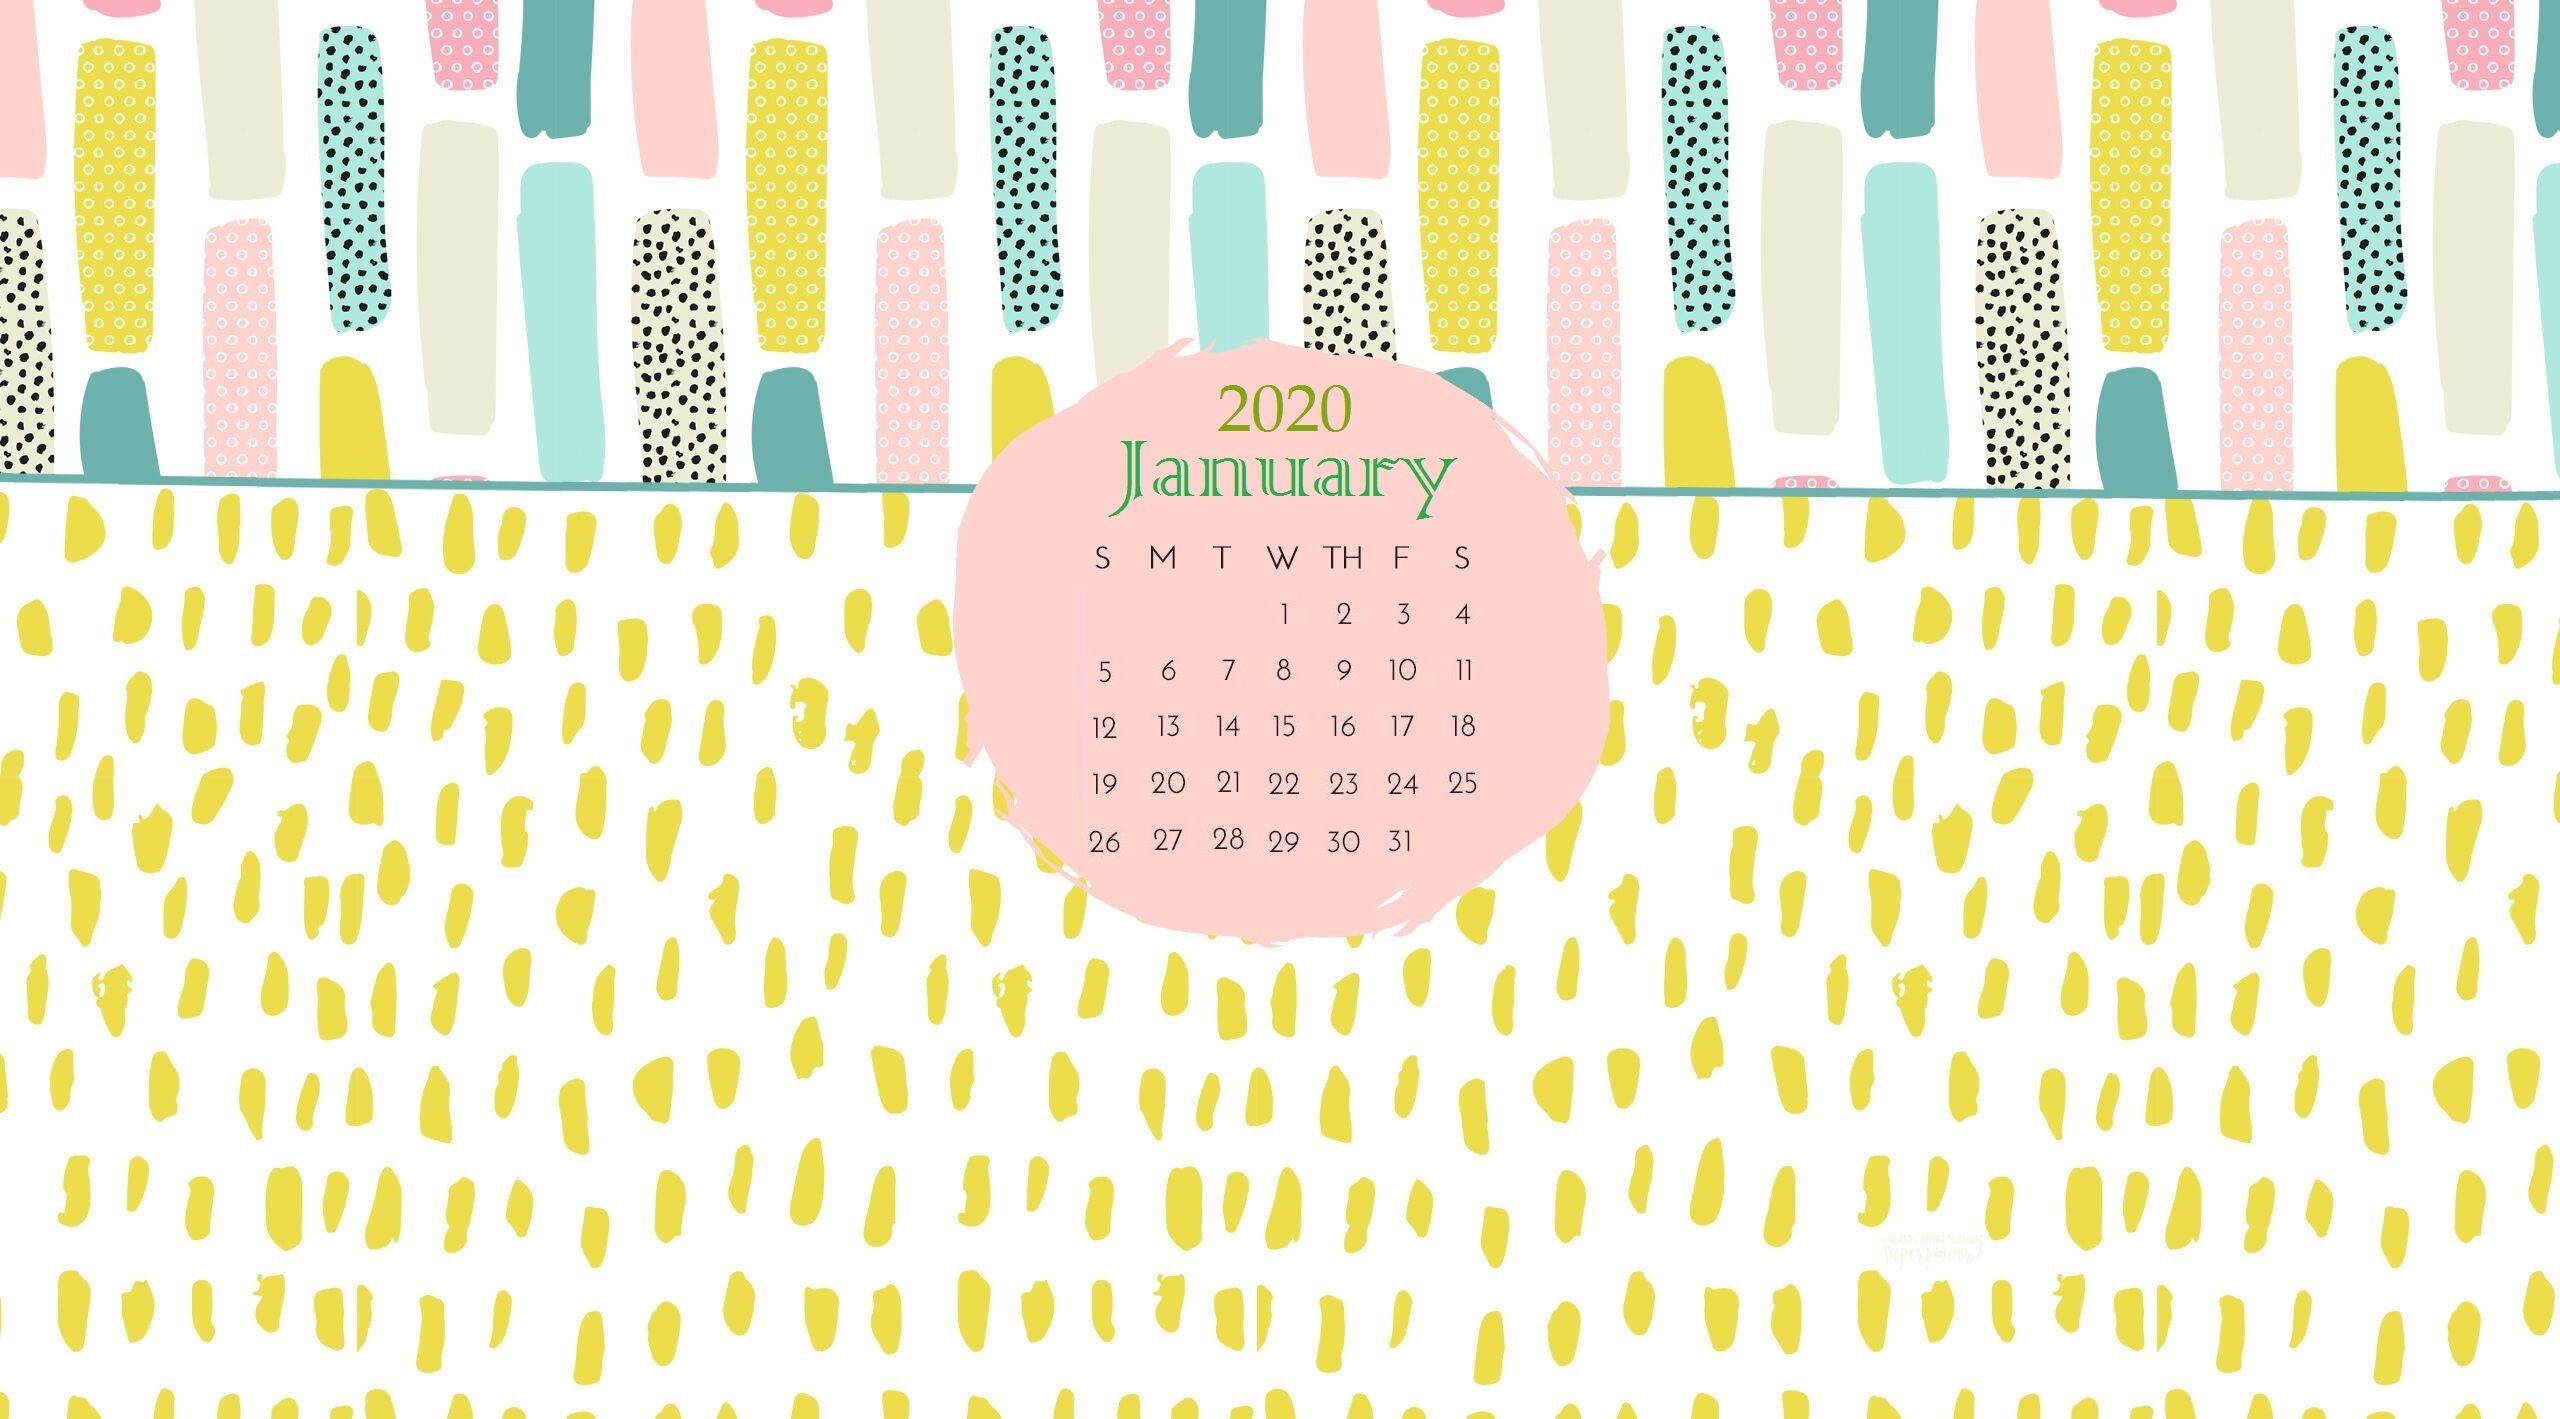 January 2020 Cute Calendar Calendar 2019 2560x1419